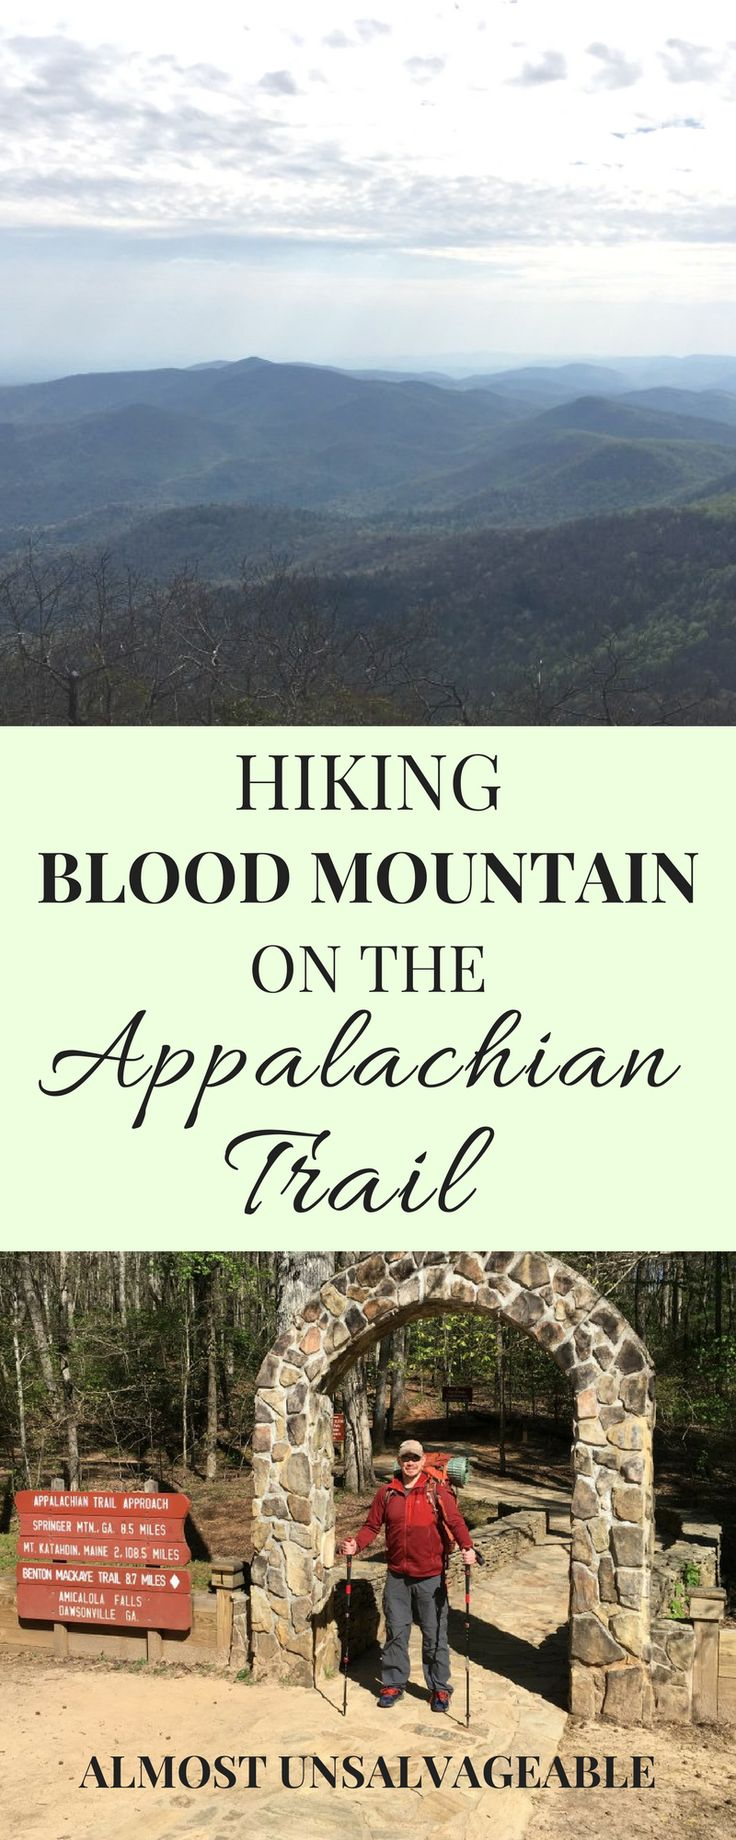 Hiking Blood Mountain on the Appalachian Trail #hiking #travel #hikingtips